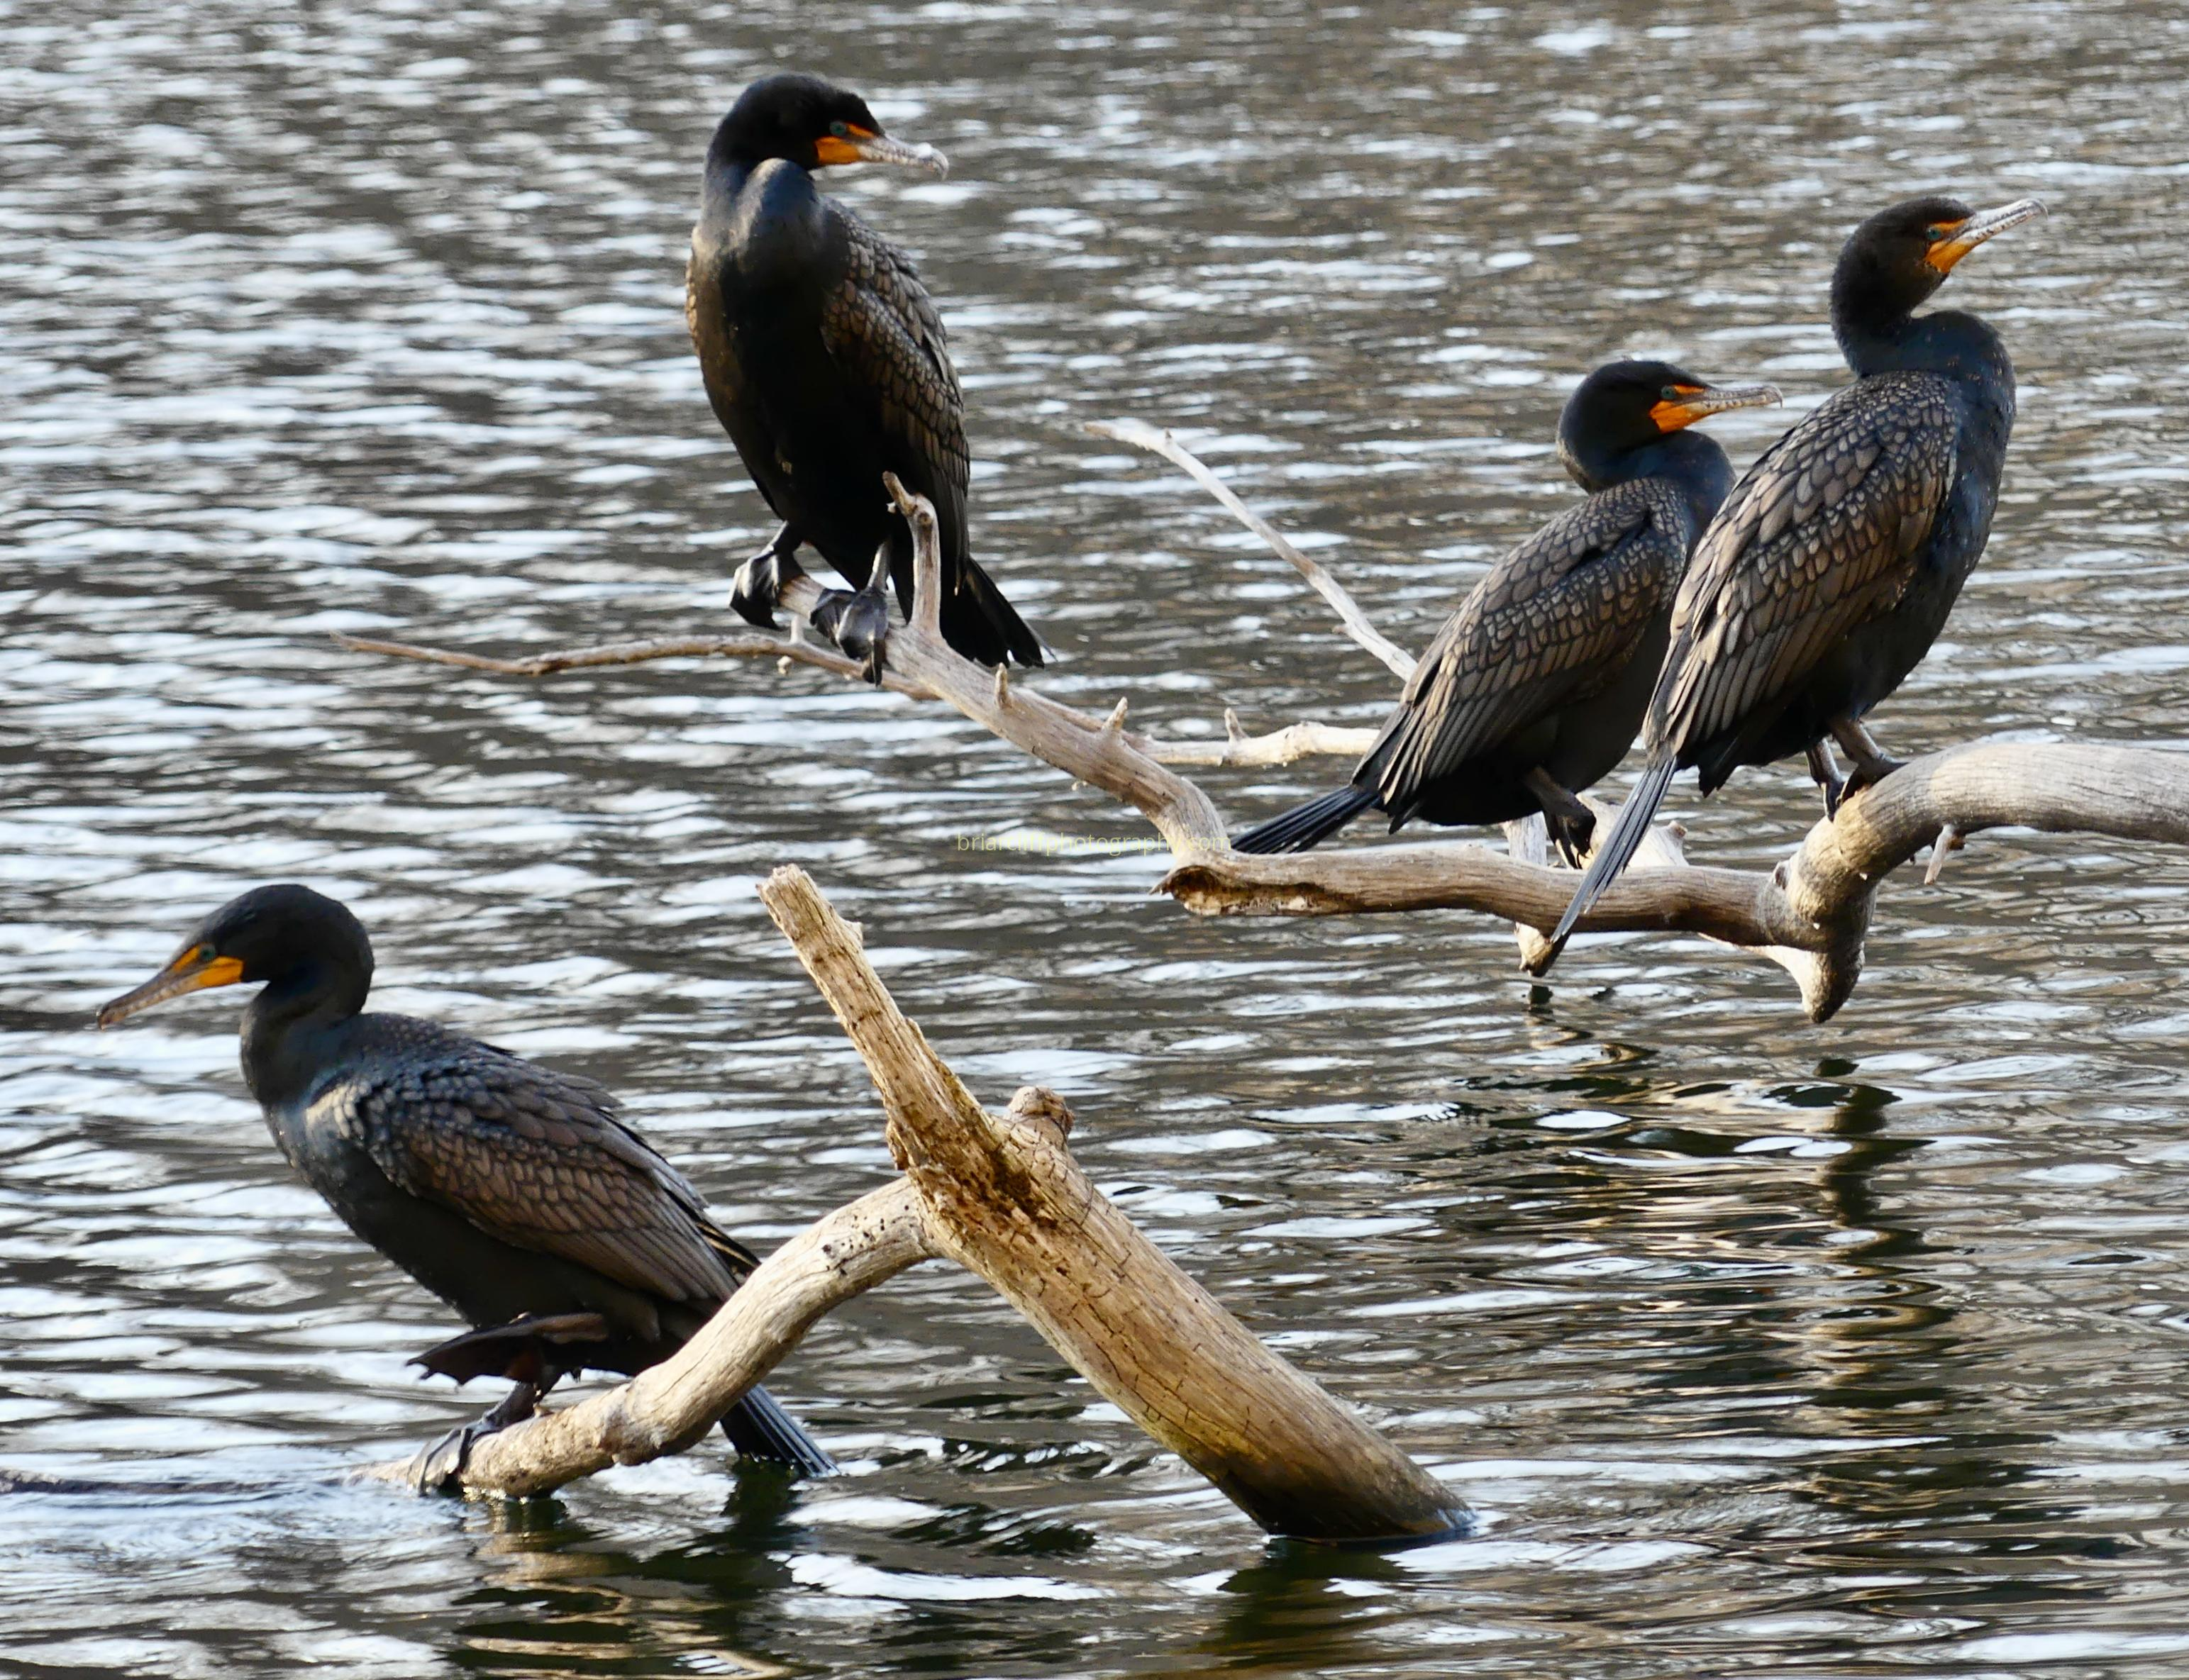 Four double-crested cormorants